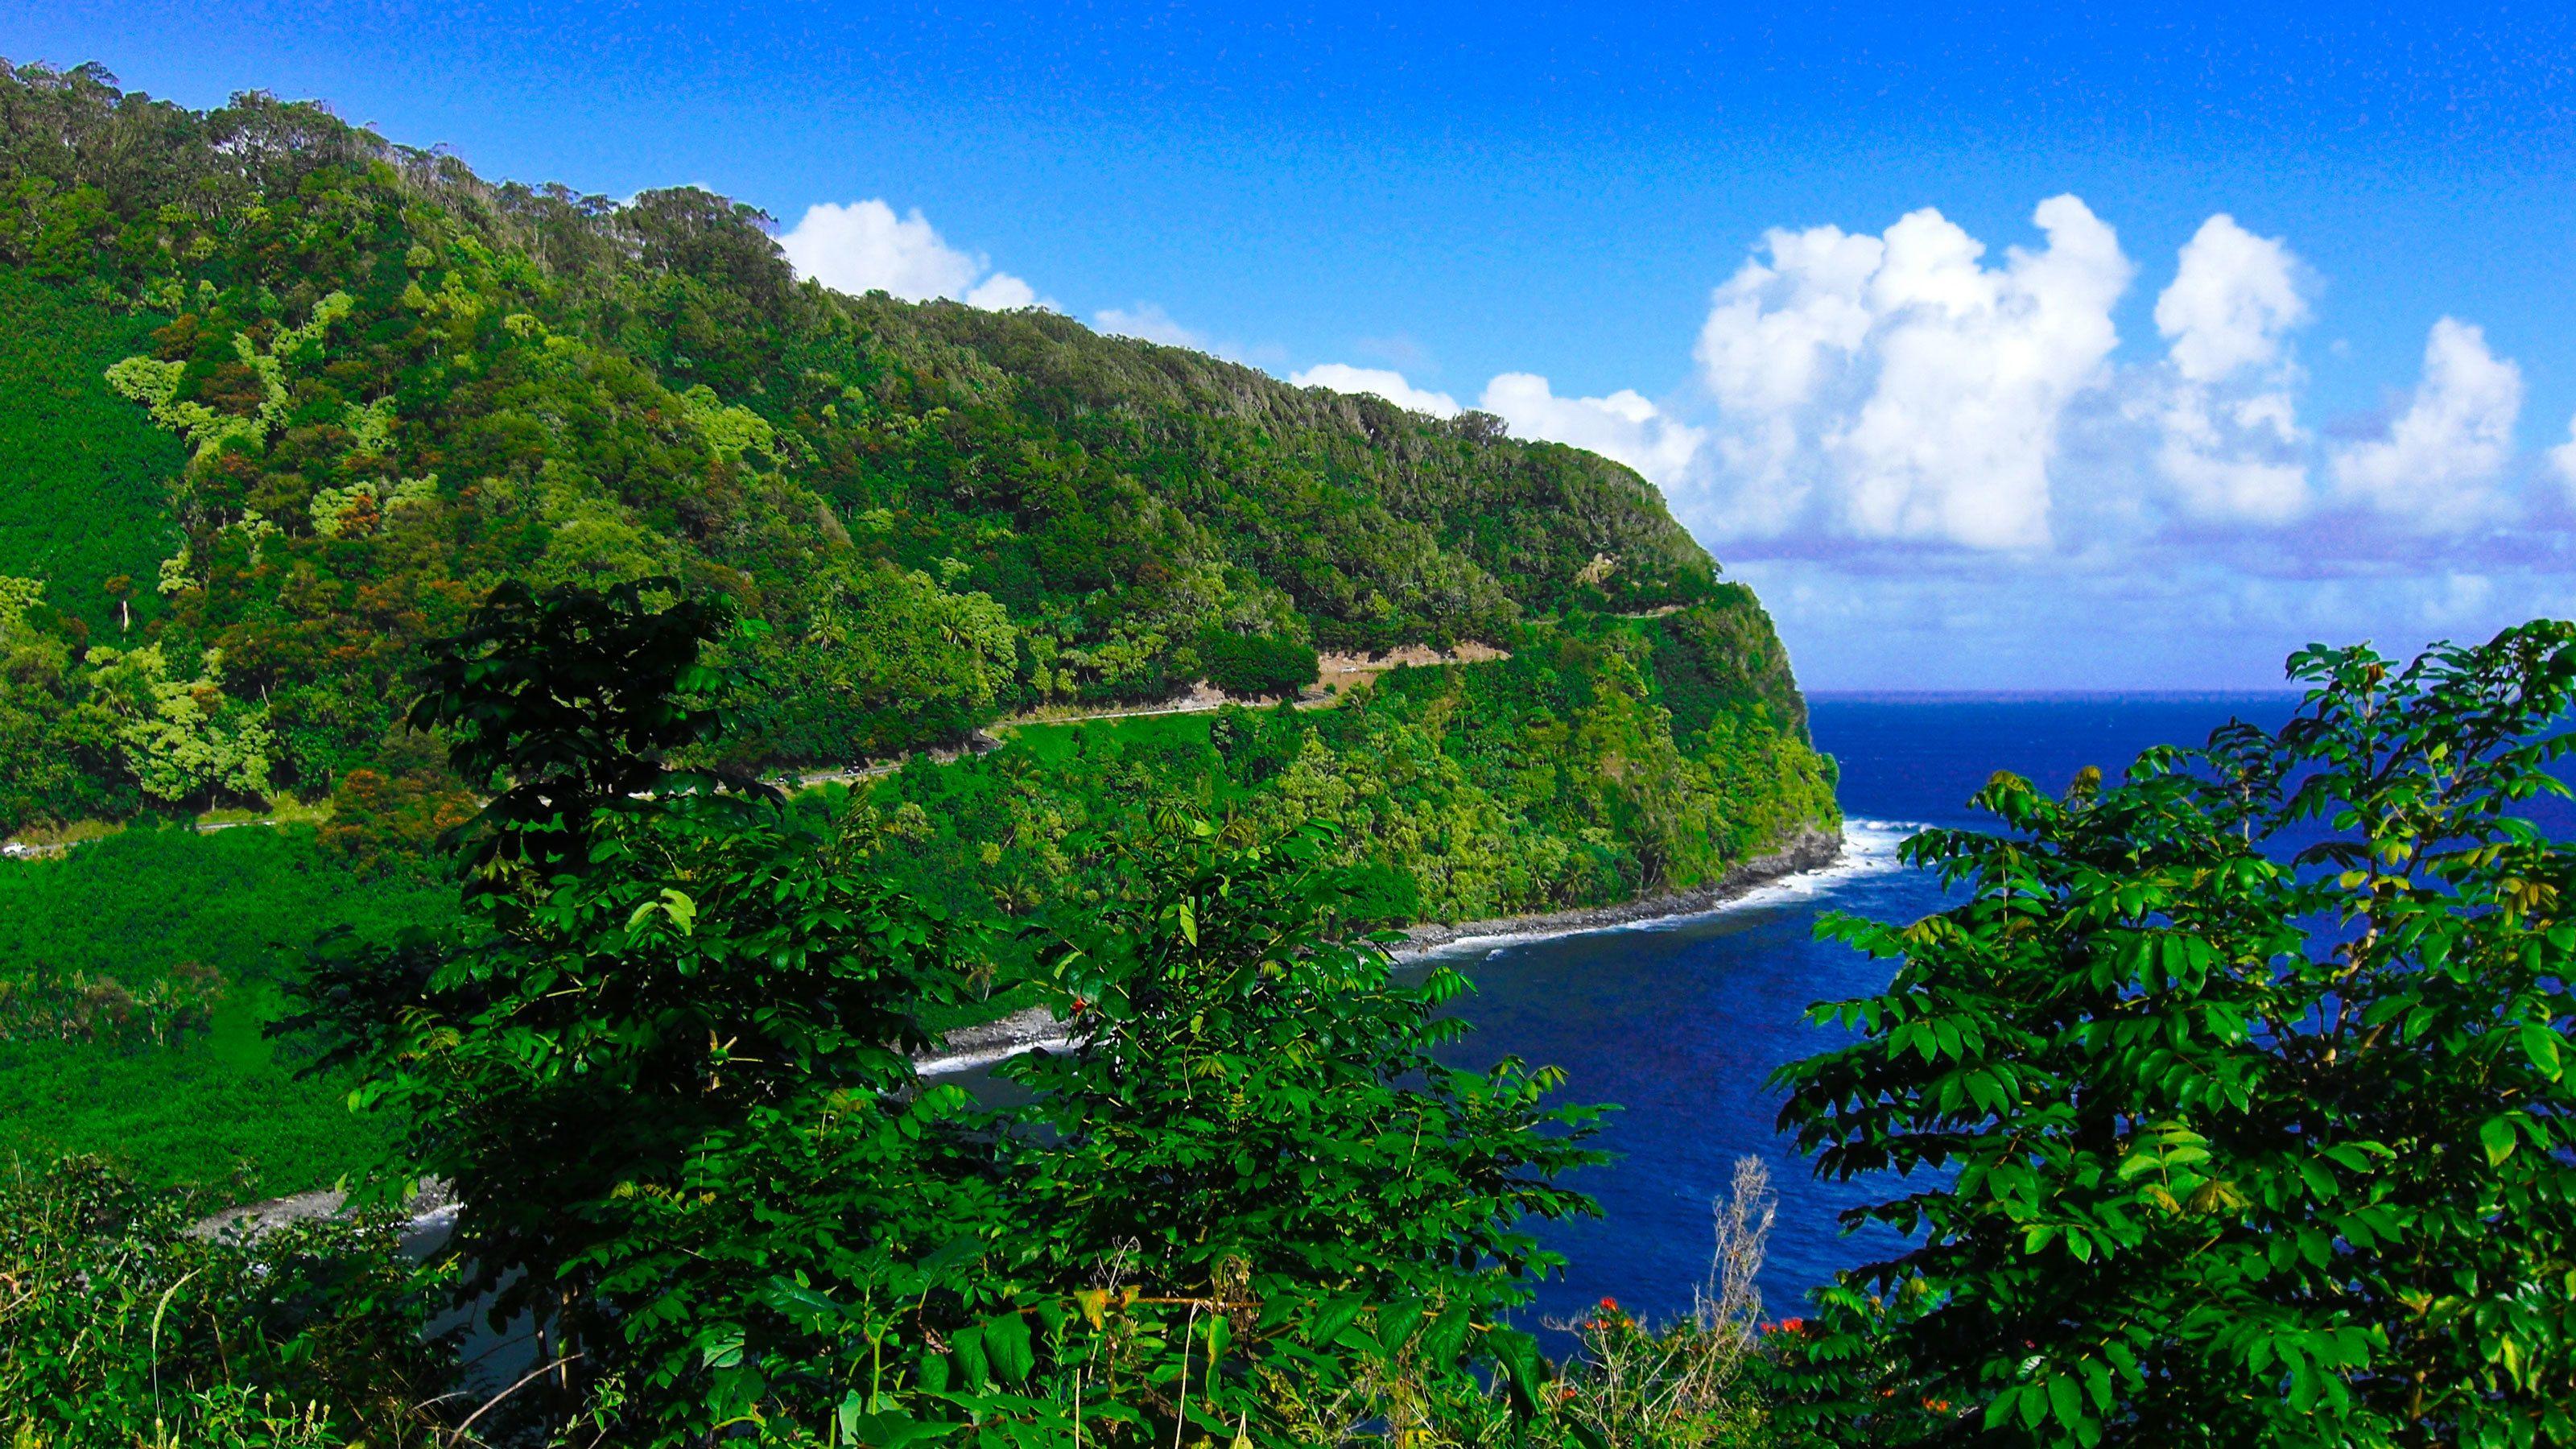 Green landscape near the water in Maui